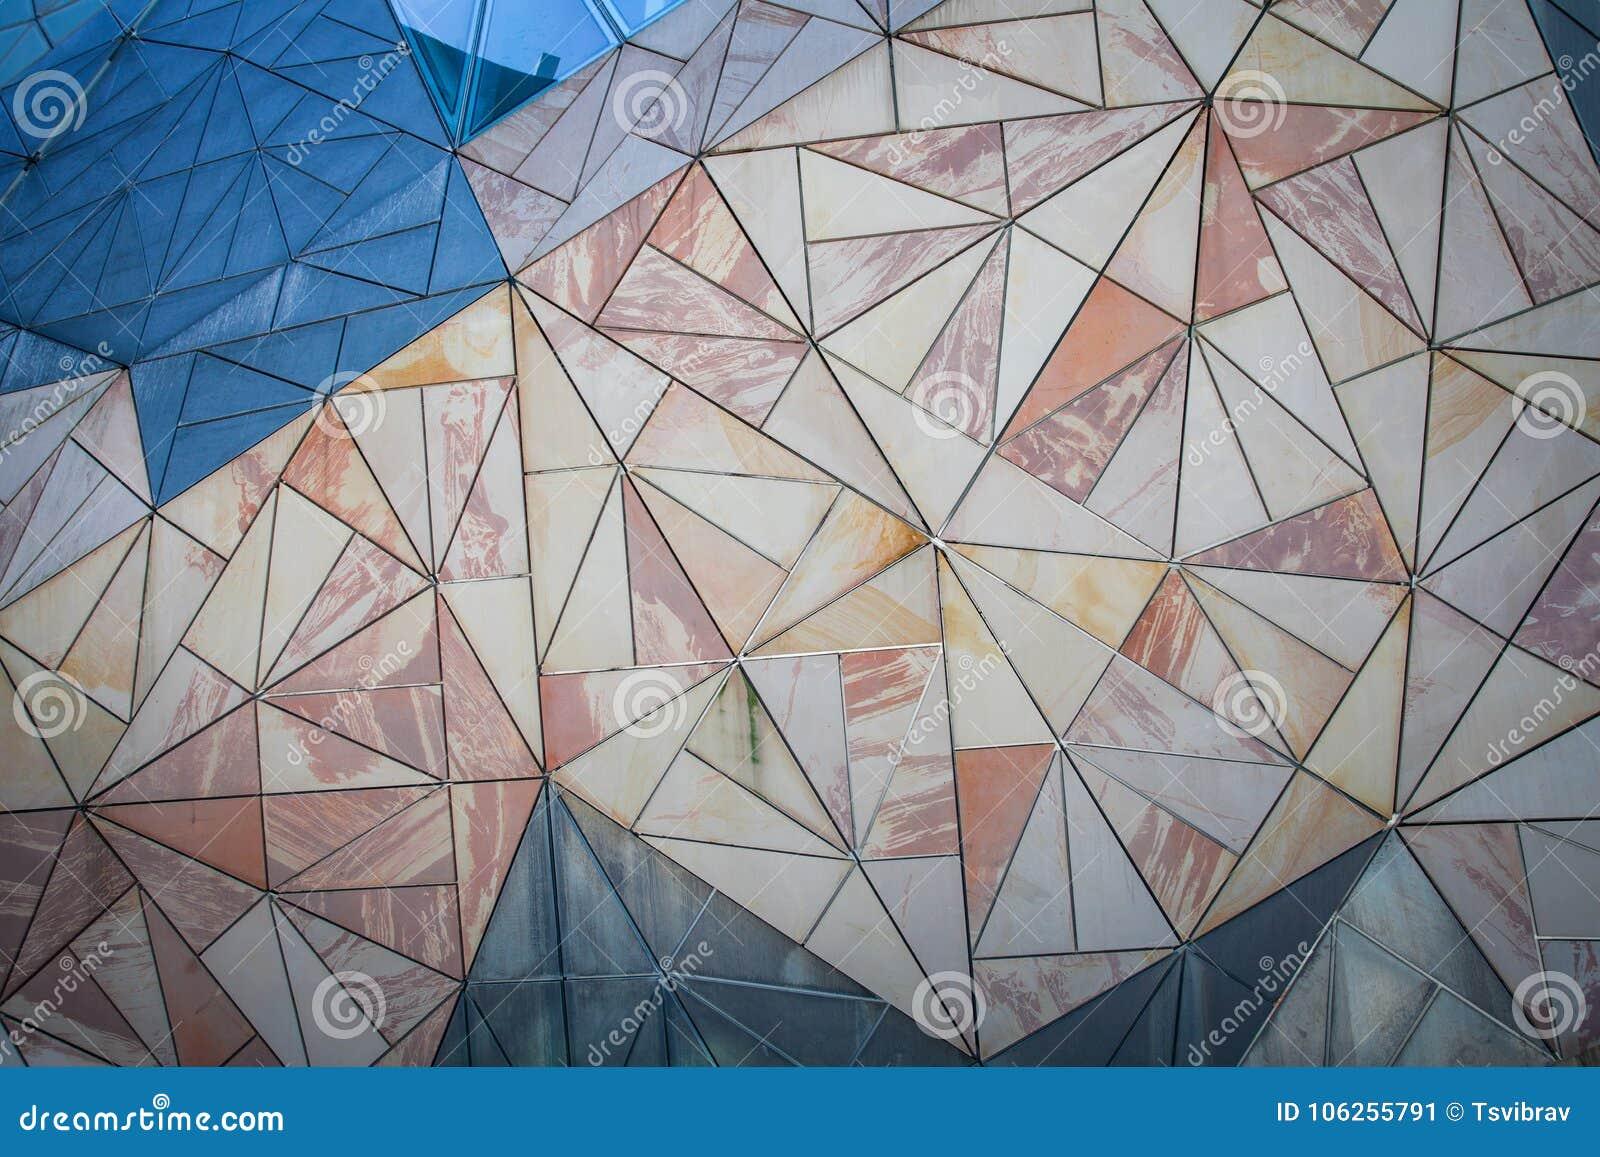 Geometric triangle pattern background on wall.